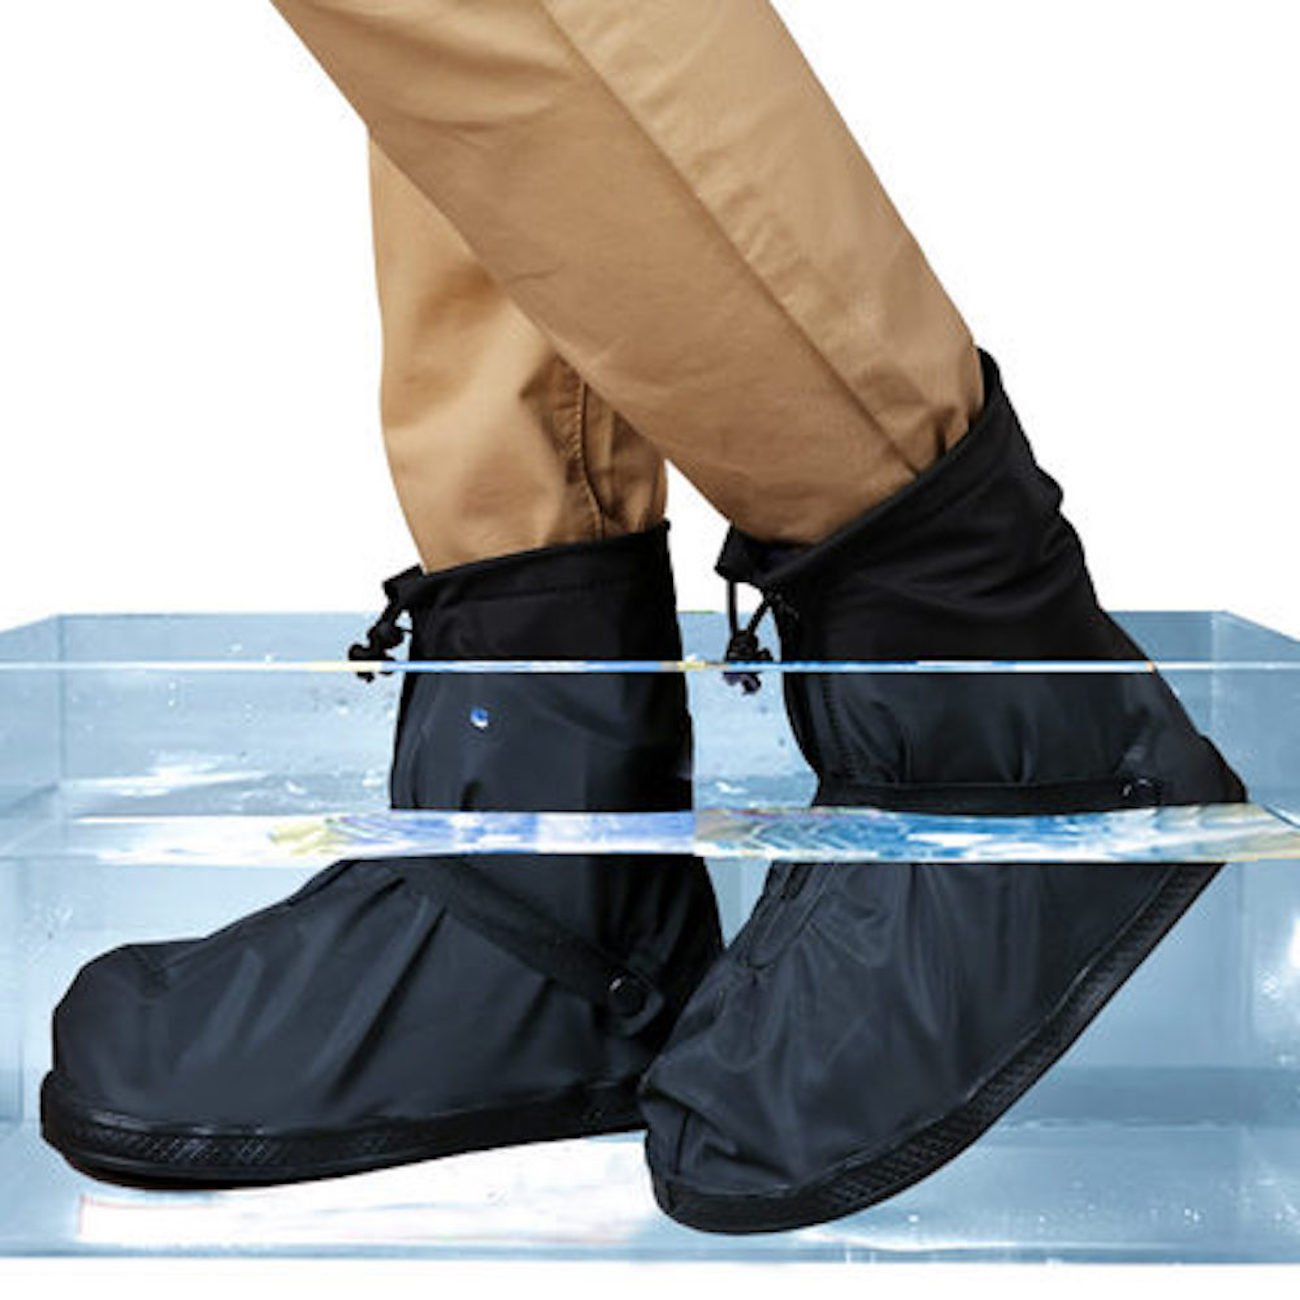 Life-C Black Waterproof Snow Rain Shoes Covers Women Men XXXXL by Life-C (Image #1)